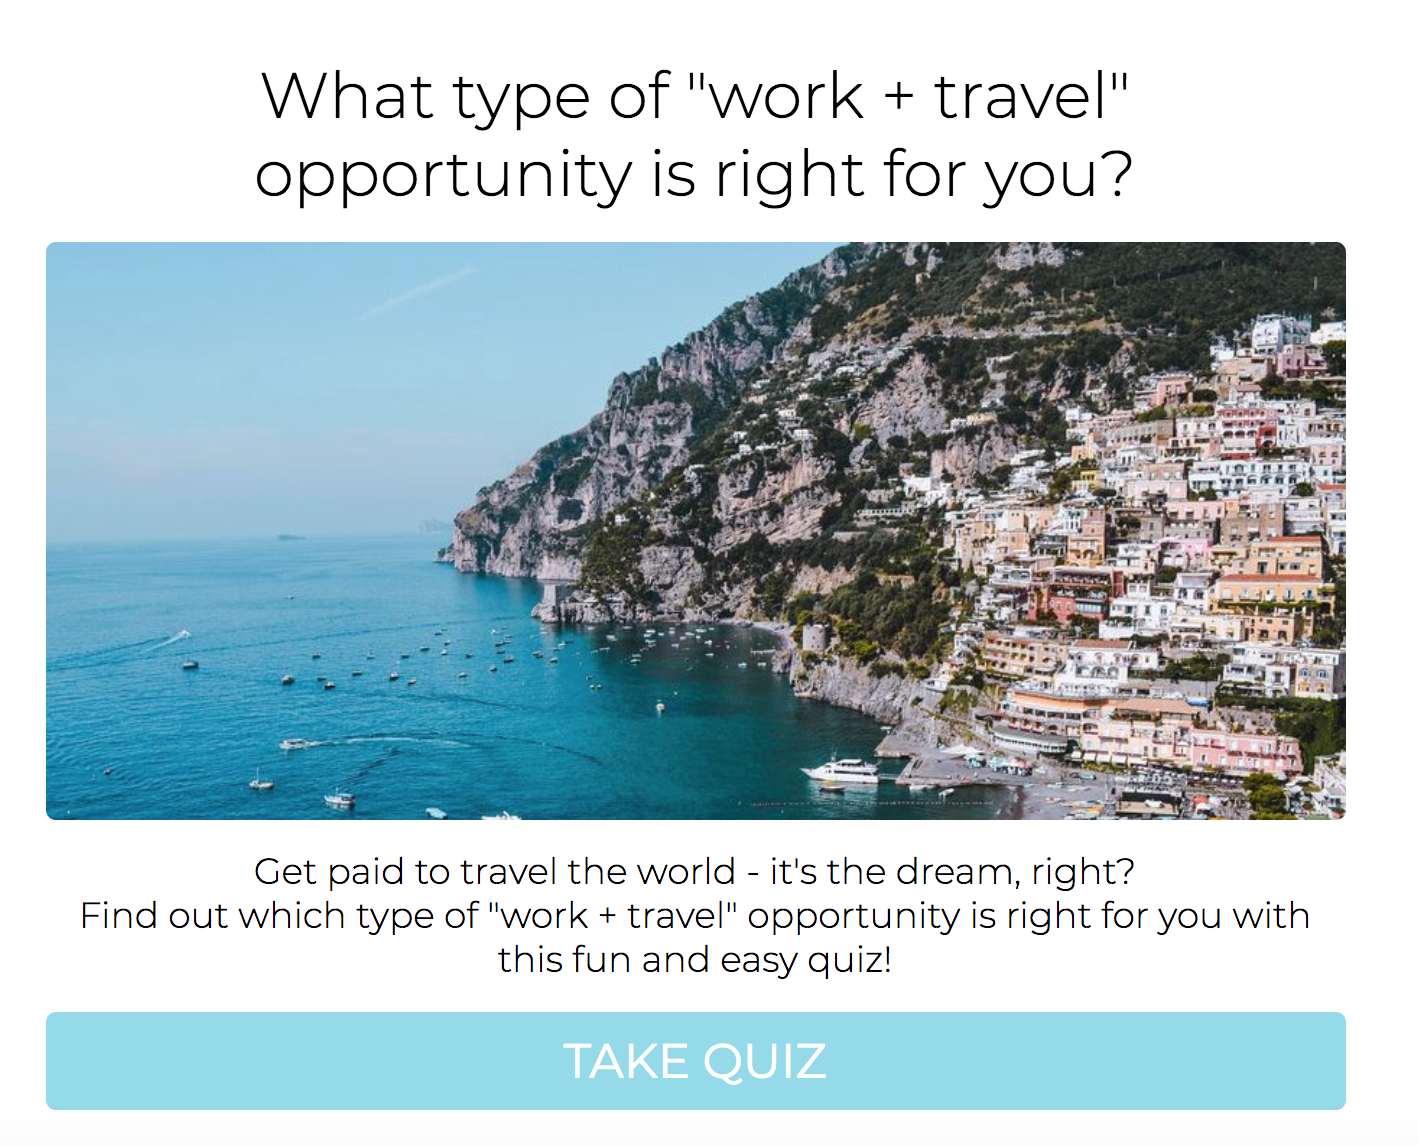 create-online-quiz / April 2018 roundup on goseekexplore.com